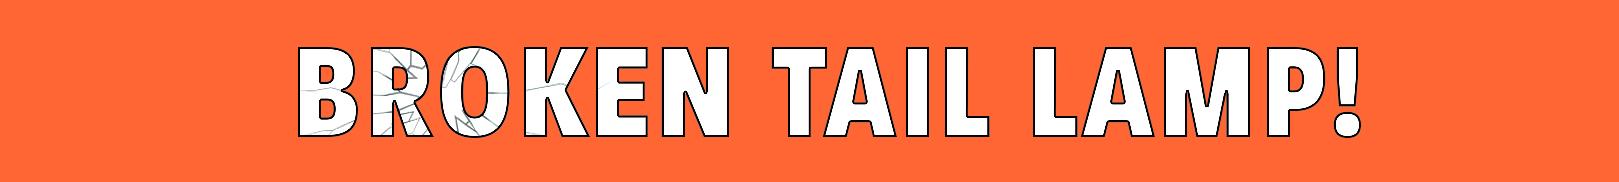 Broken Tail Lamp_Apr 2020